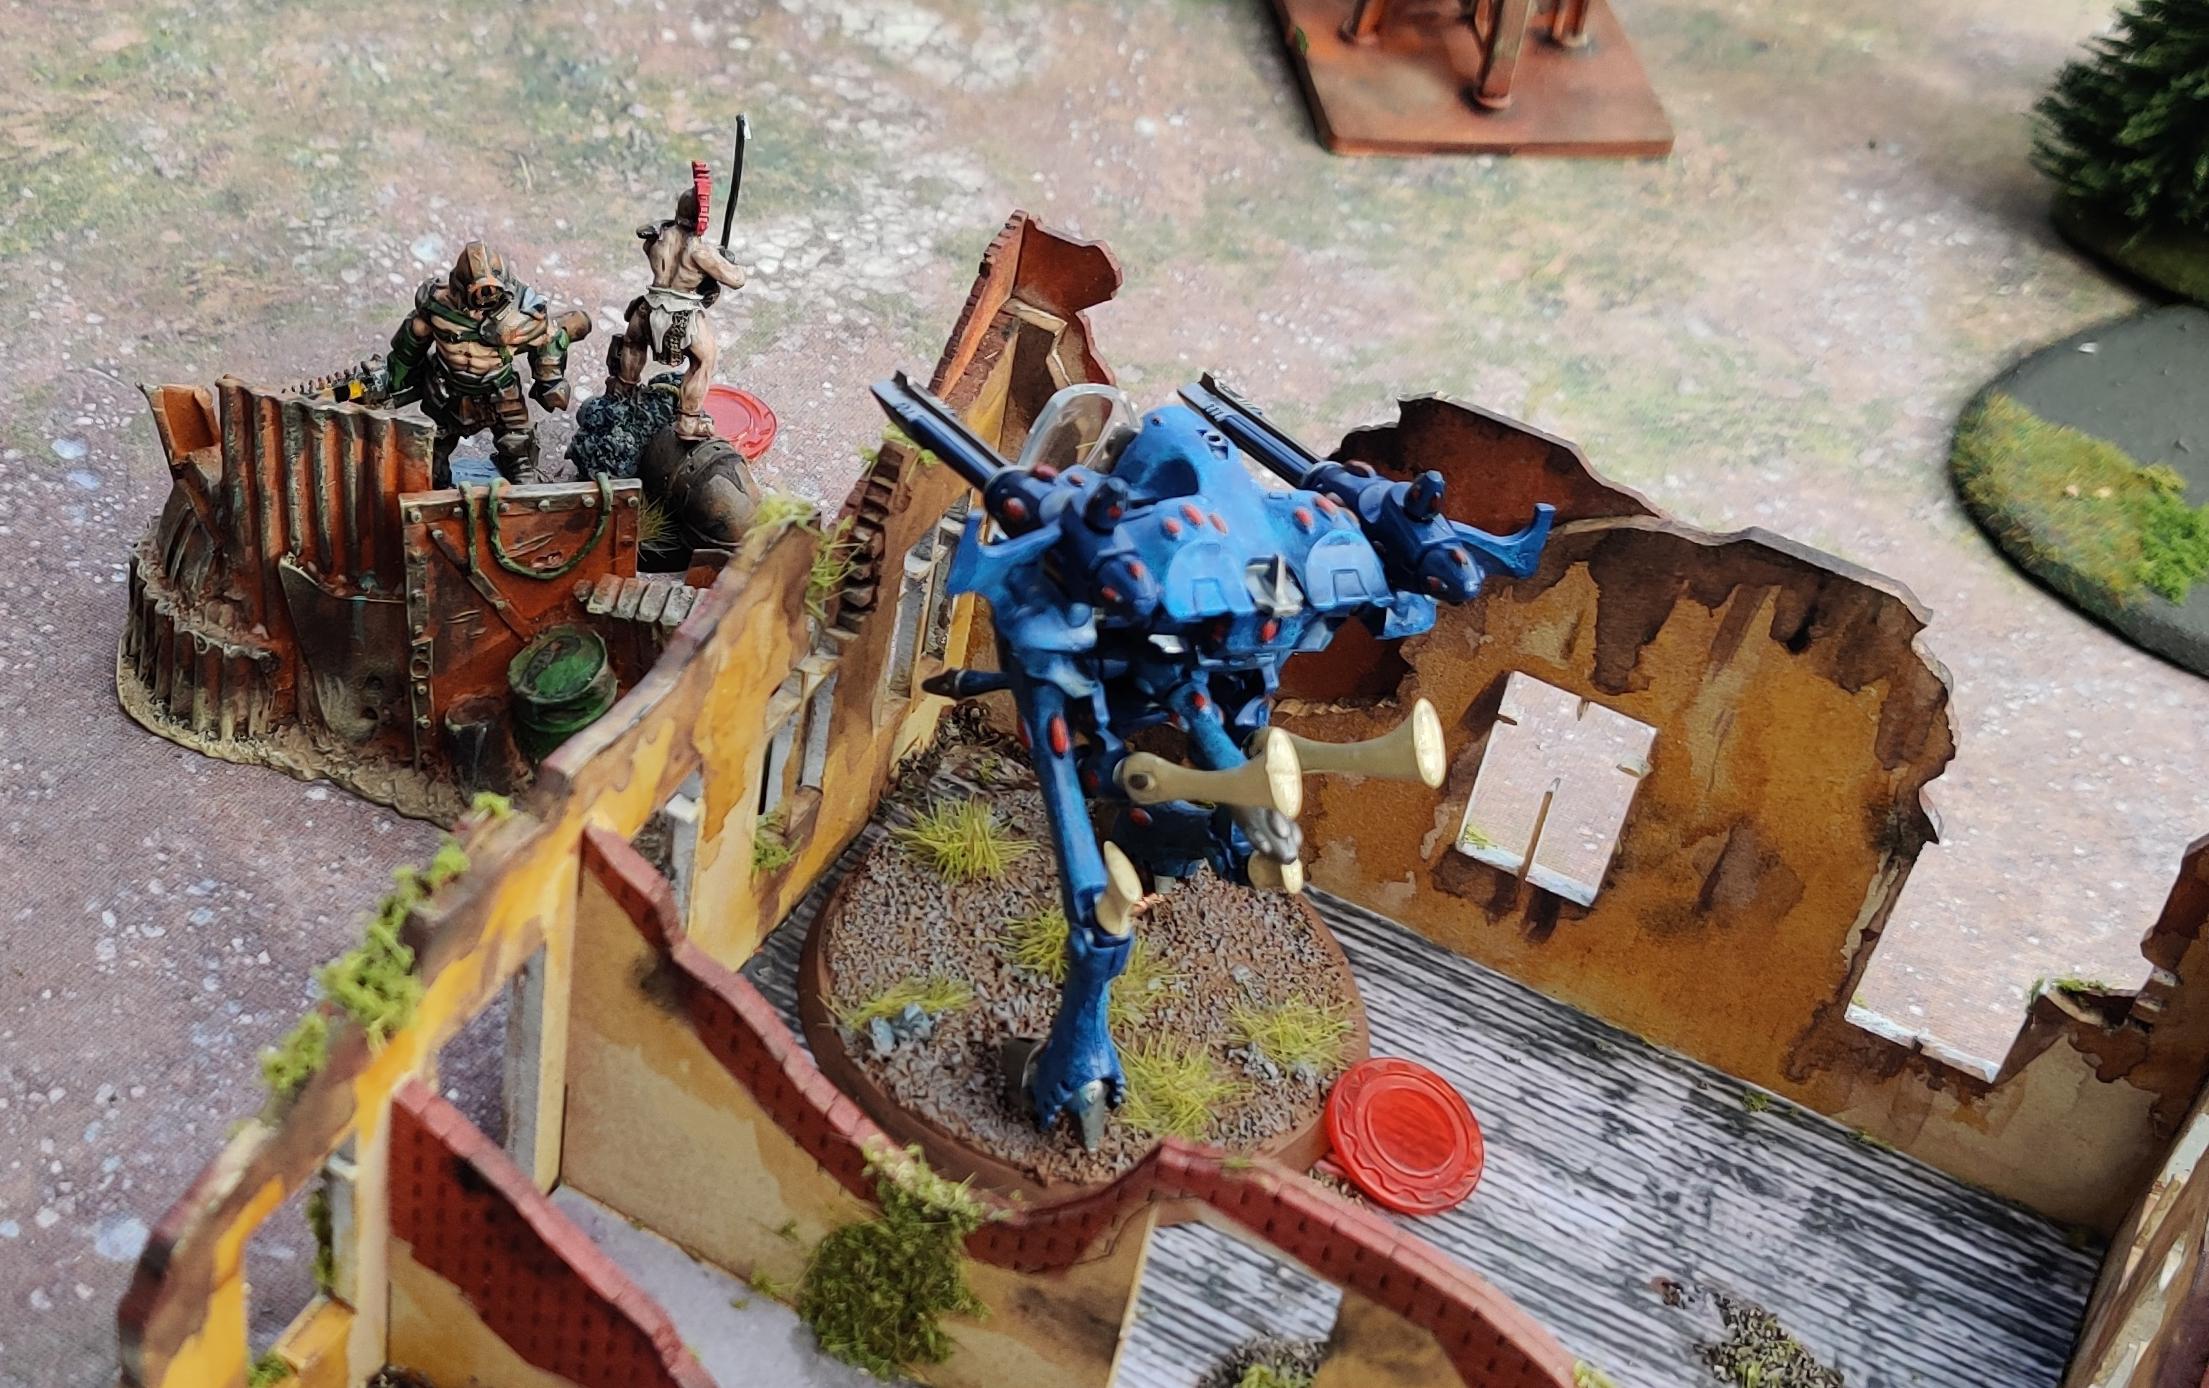 turn 2 - ambushers gutted